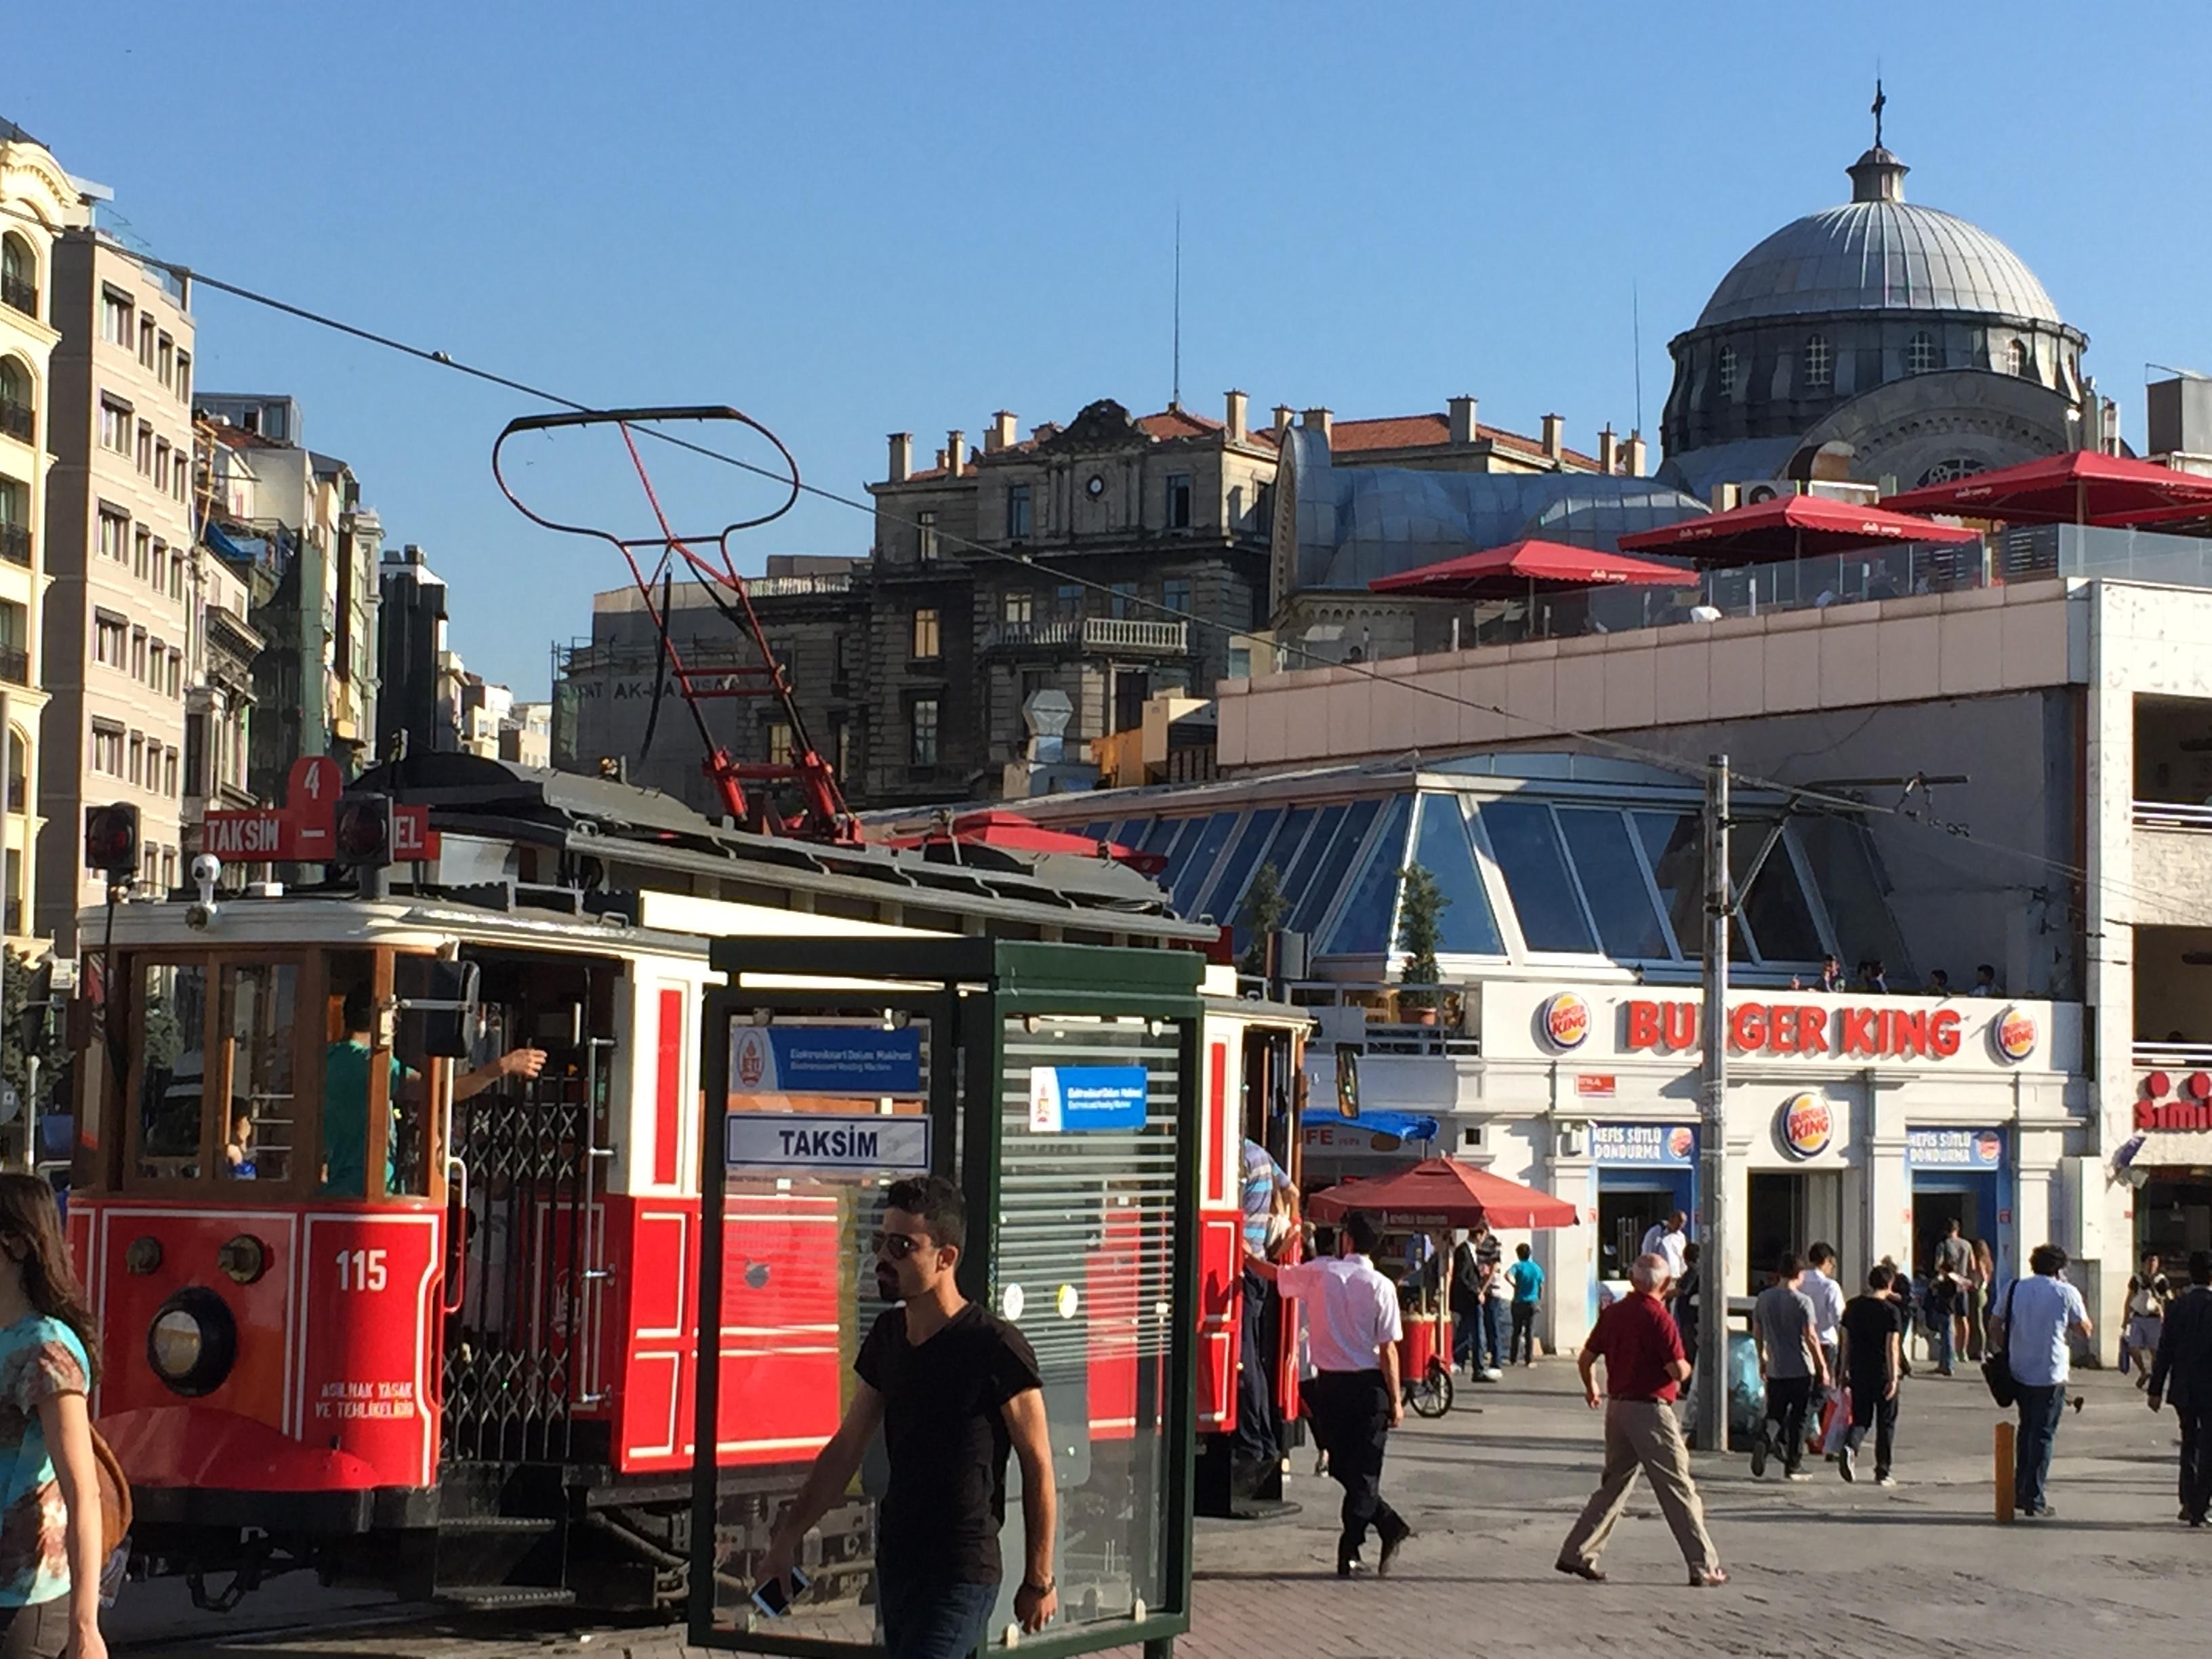 Istanbul public transportation